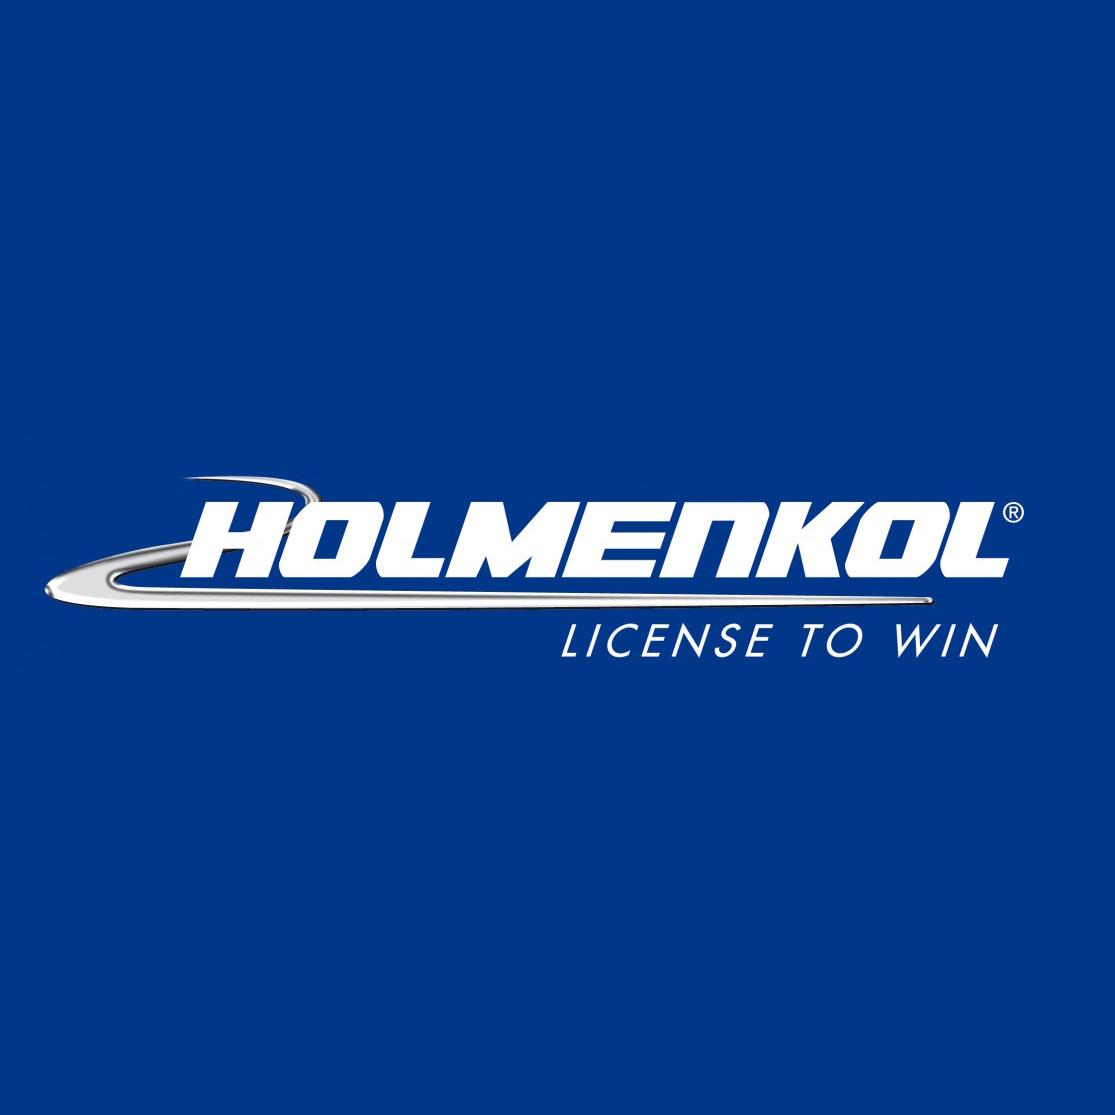 Logo Holmenkol scioline